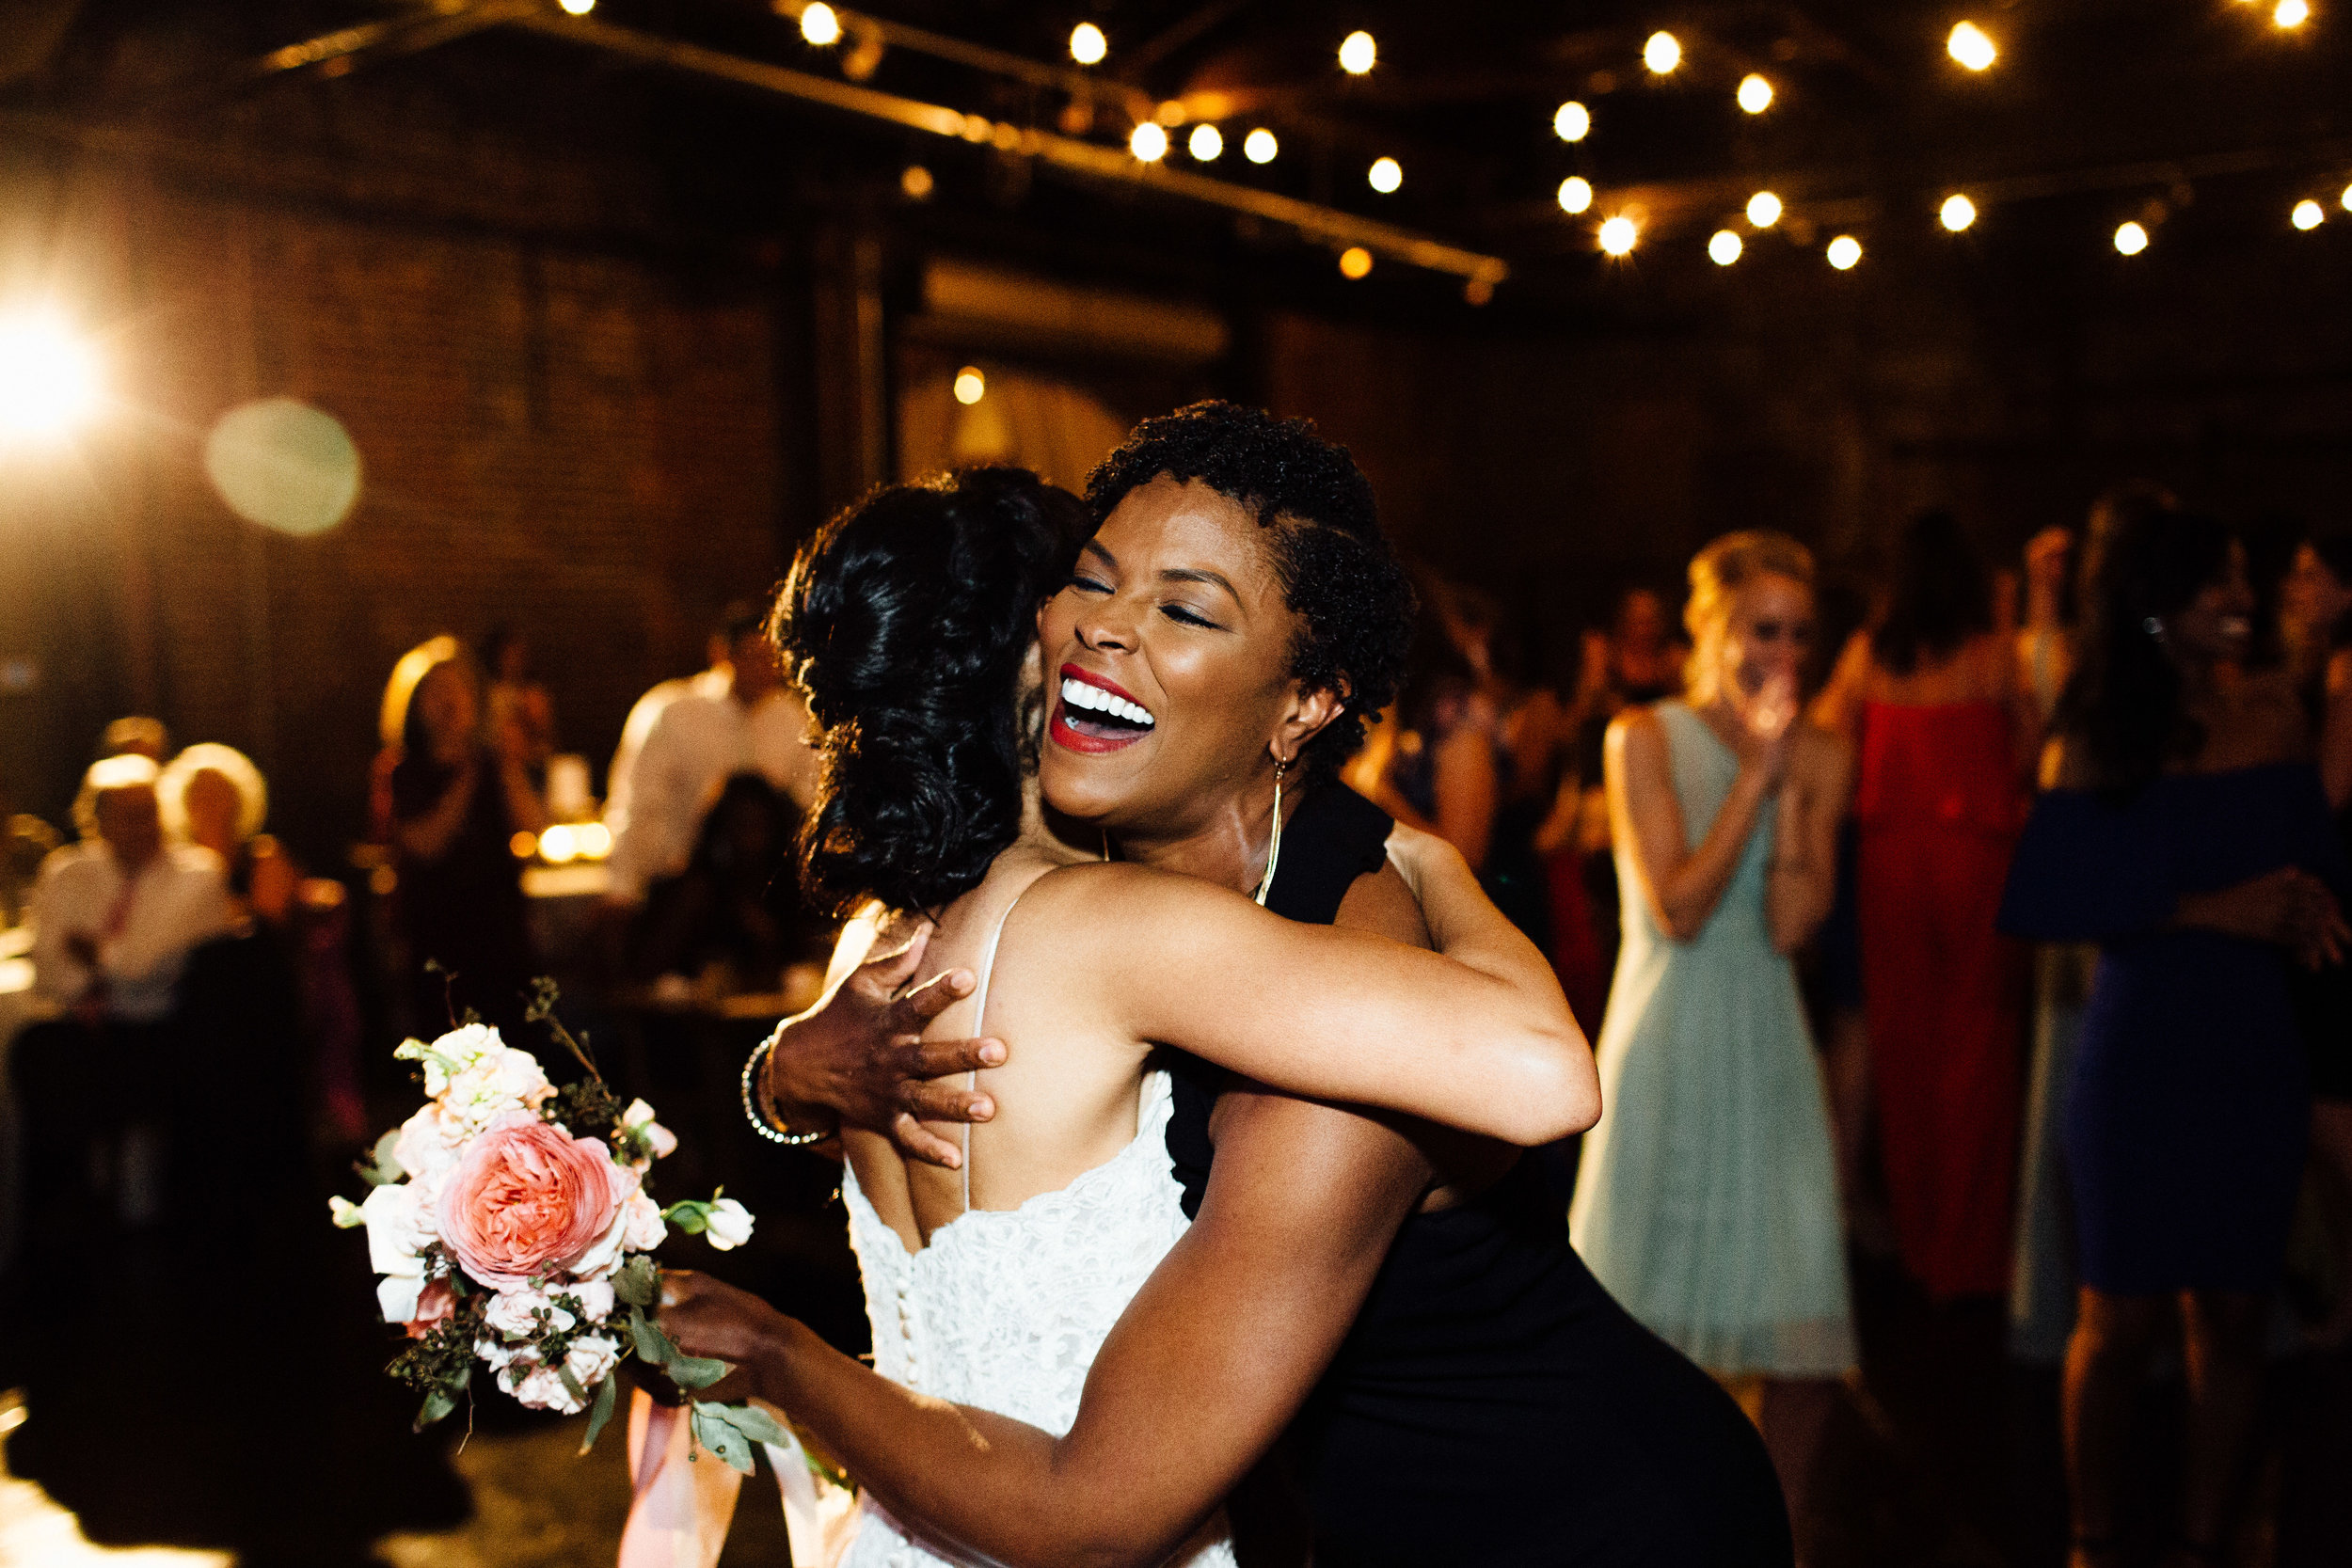 king_plow_atlanta_wedding_art_gallery_modern_lifestyle_documentary_2029.jpg